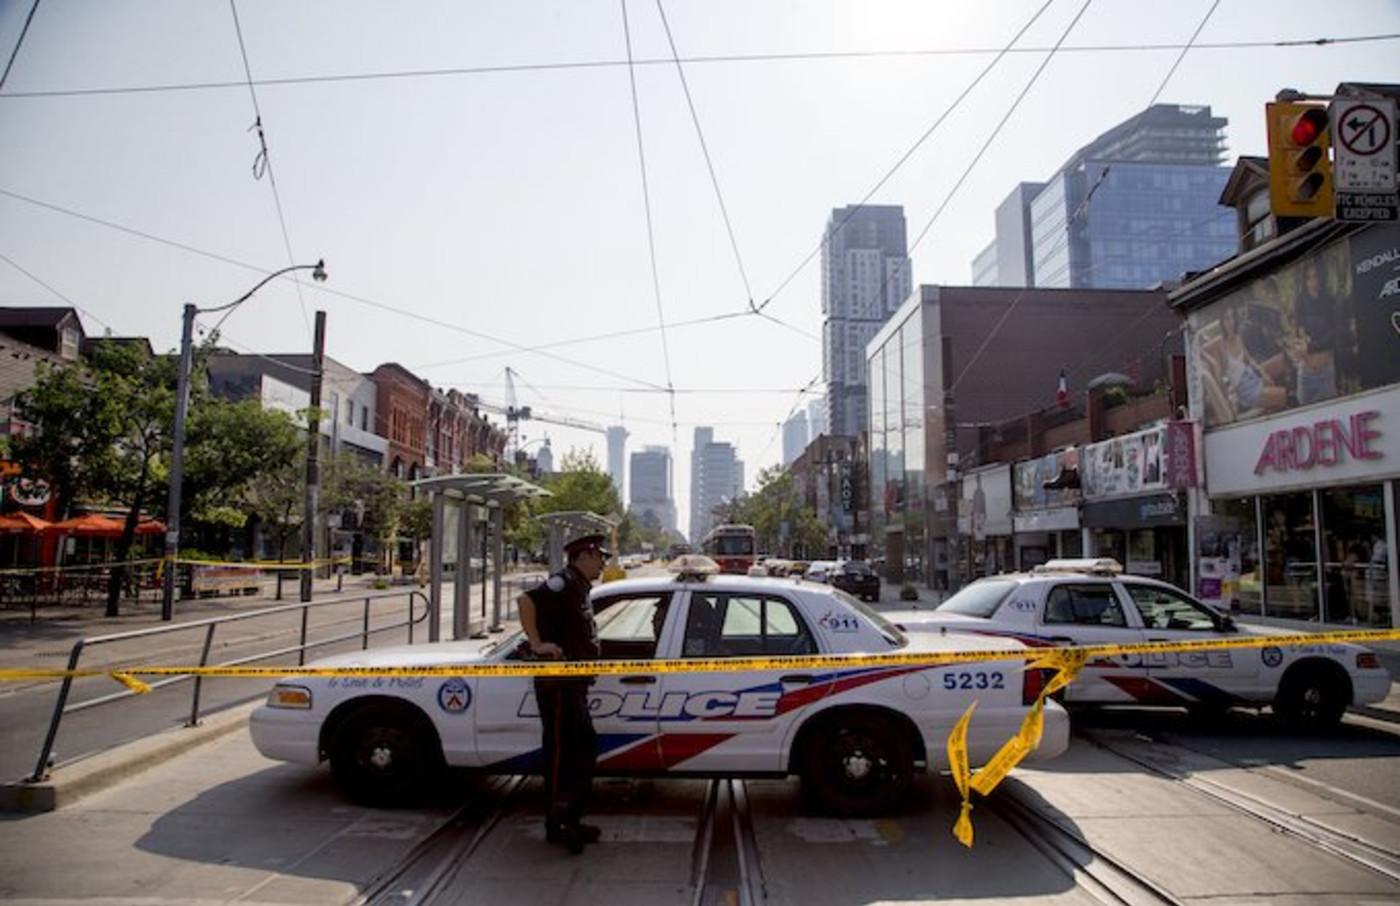 Toronto police at the scene where Smoke Dawg was shot.